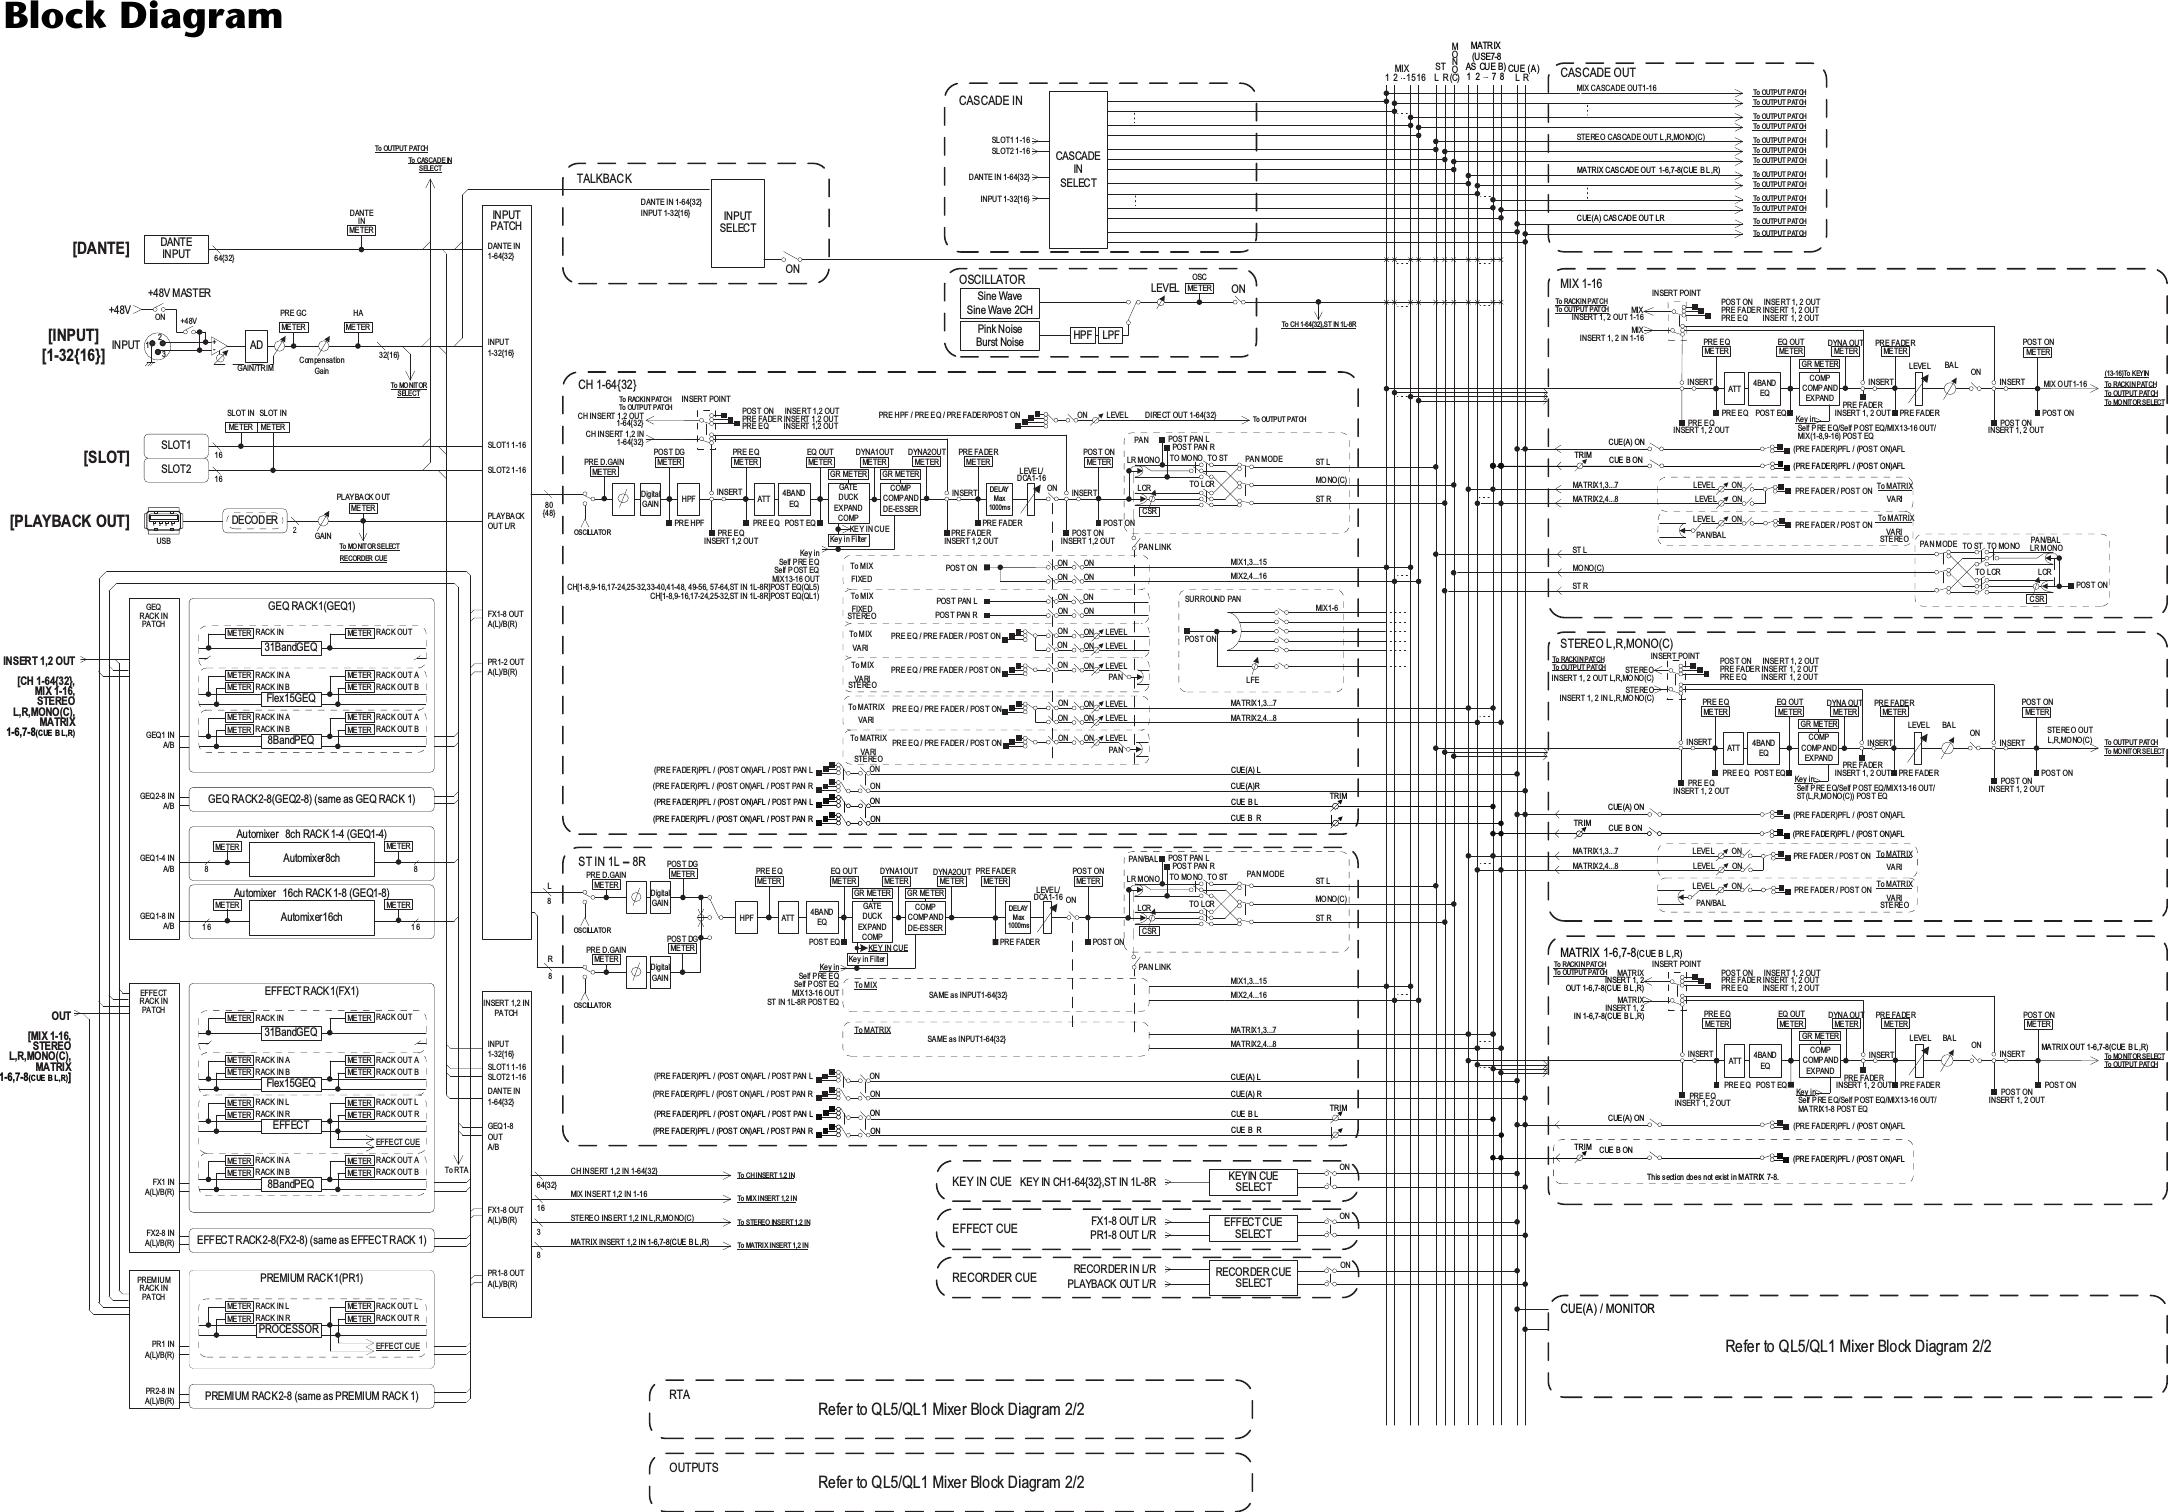 Yamaha Ql Owners Manual Series Block Diagram Ql5 V4 Year 2